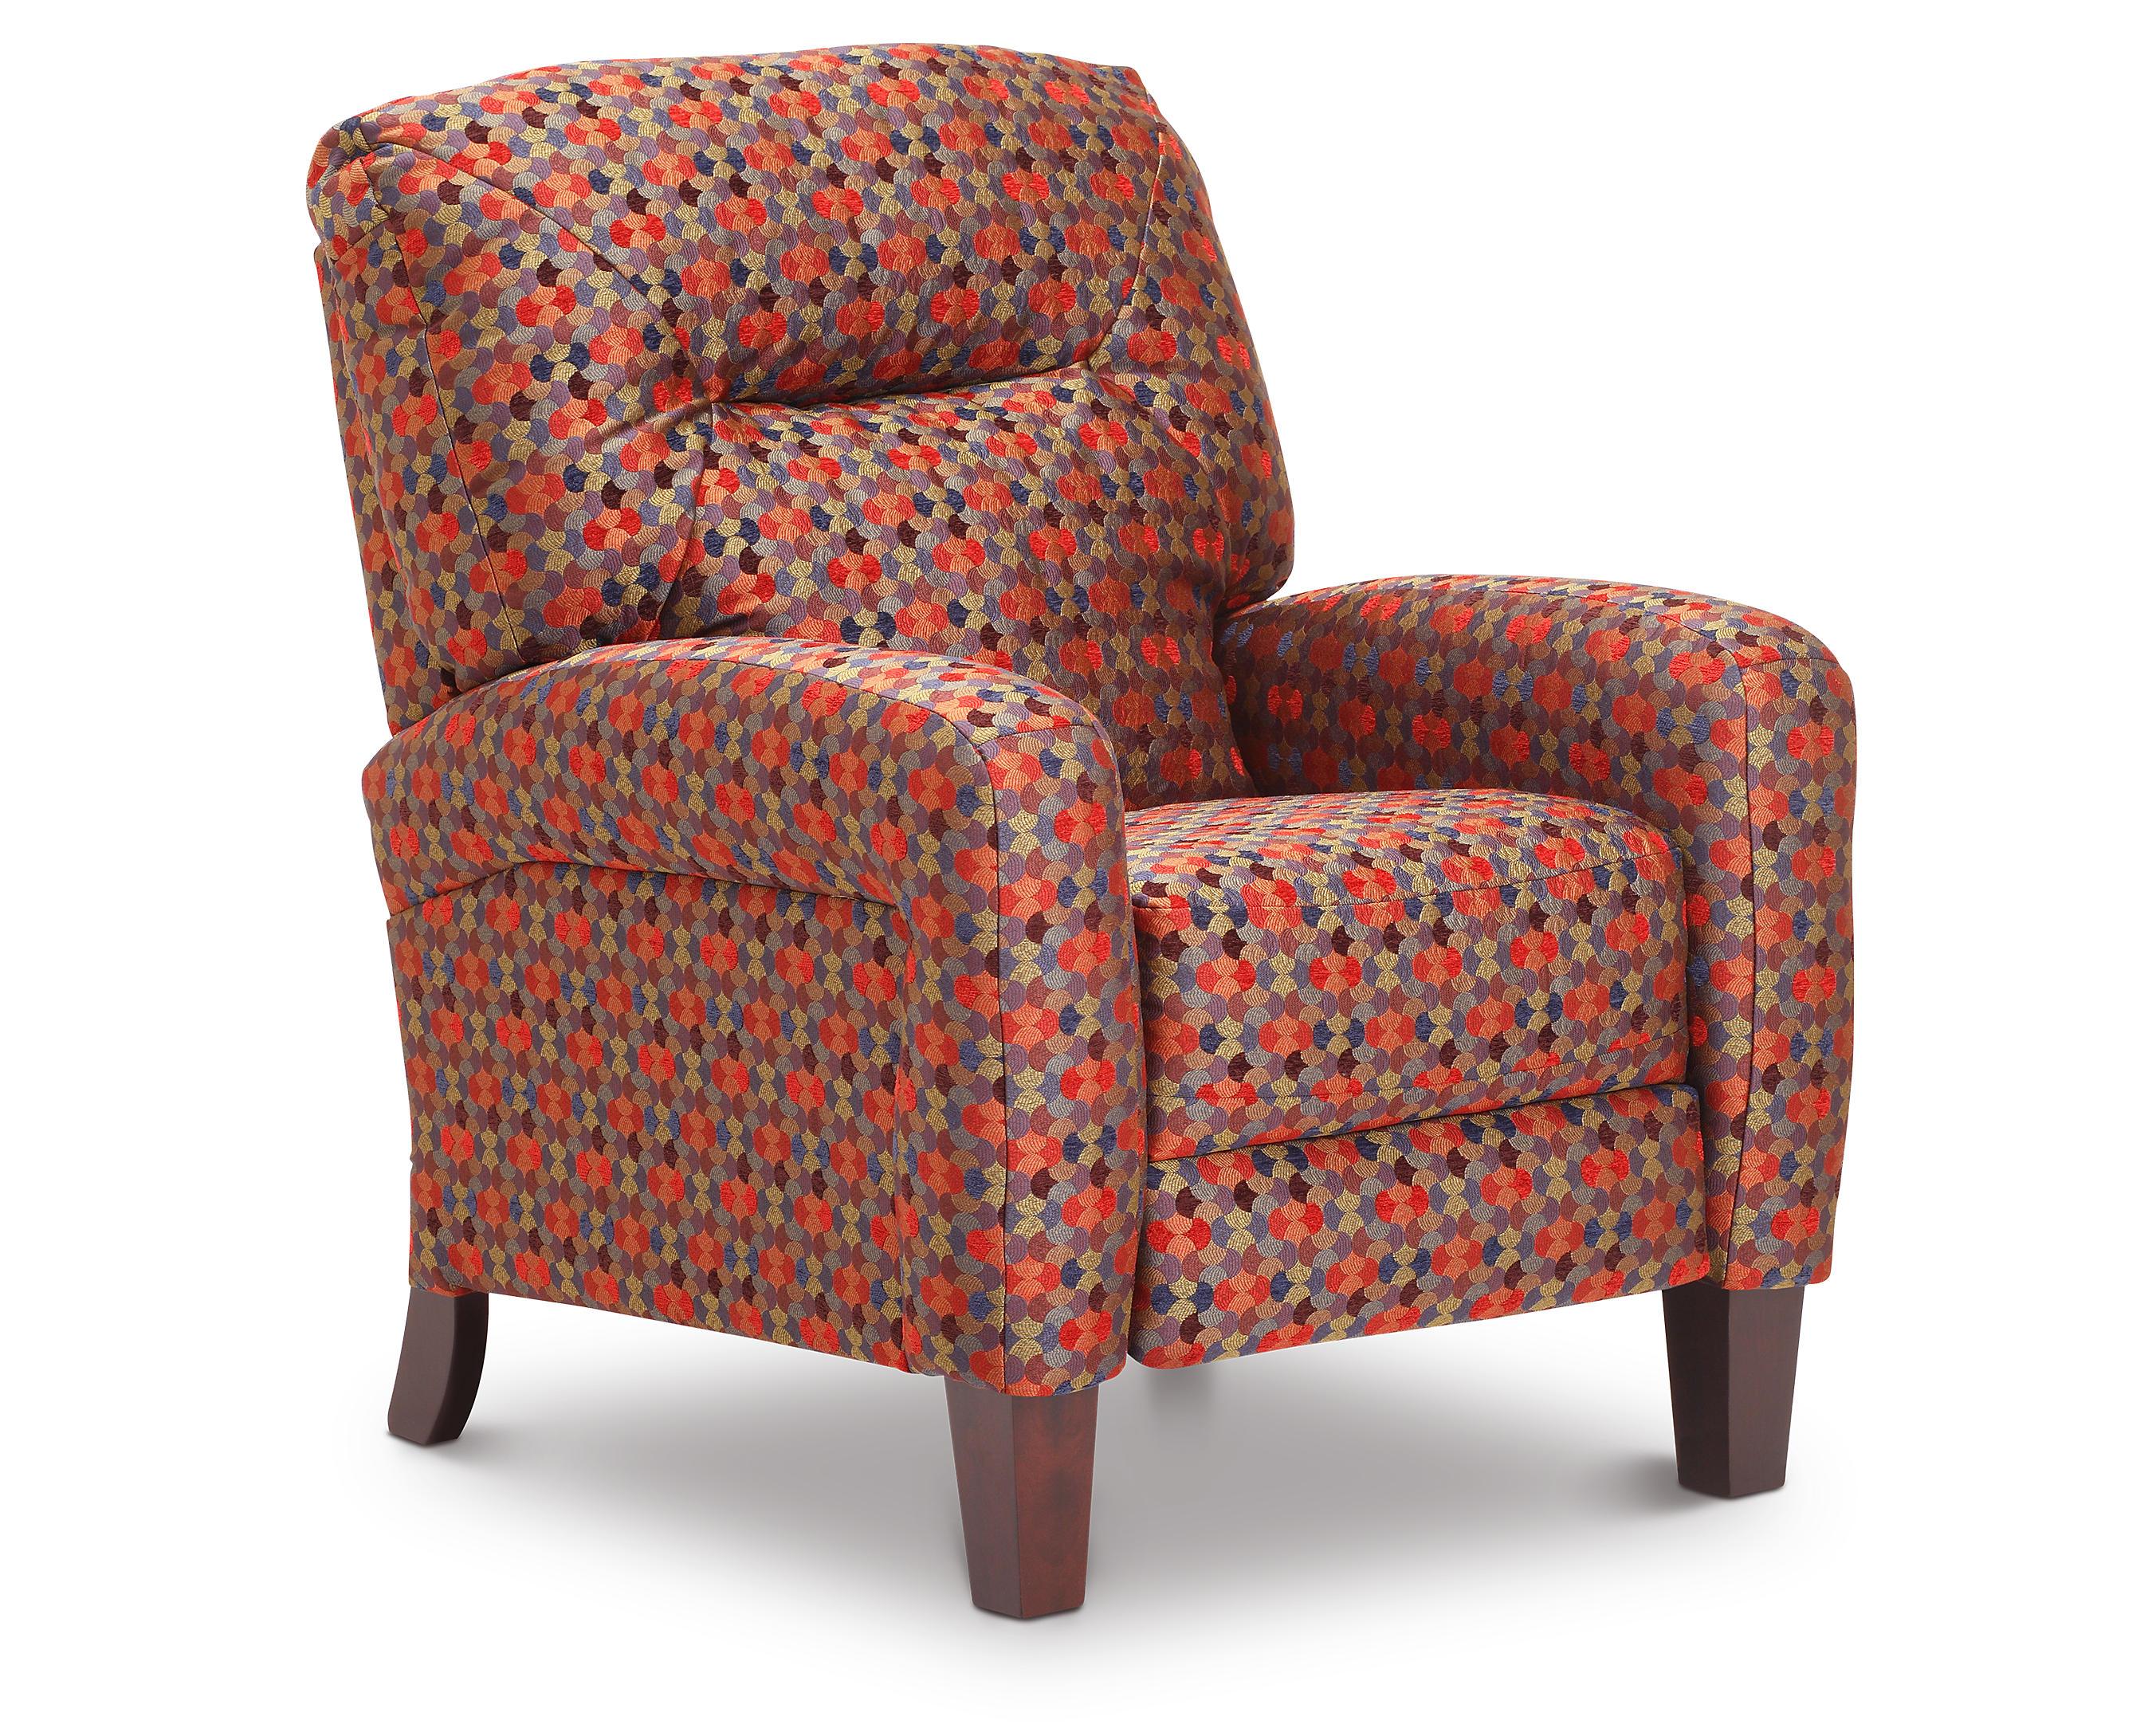 Mayfair Recliner Furniture Row